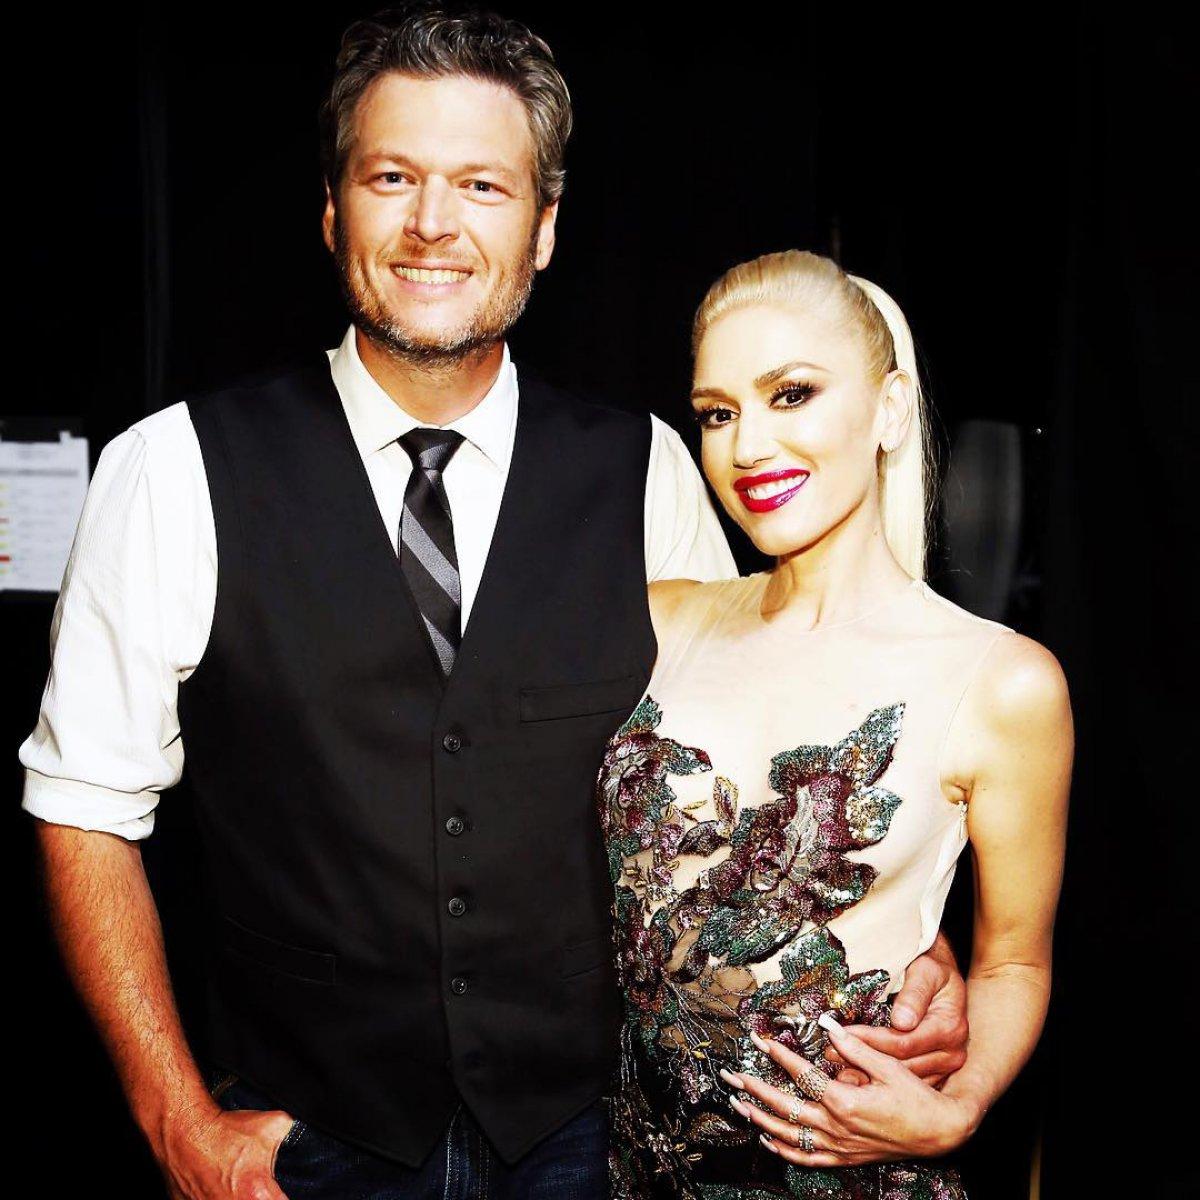 Blake Shelton And Gwen Stefani Wedding Pictures.Blake Shelton And Gwen Stefani Reportedly Starting To Finalize